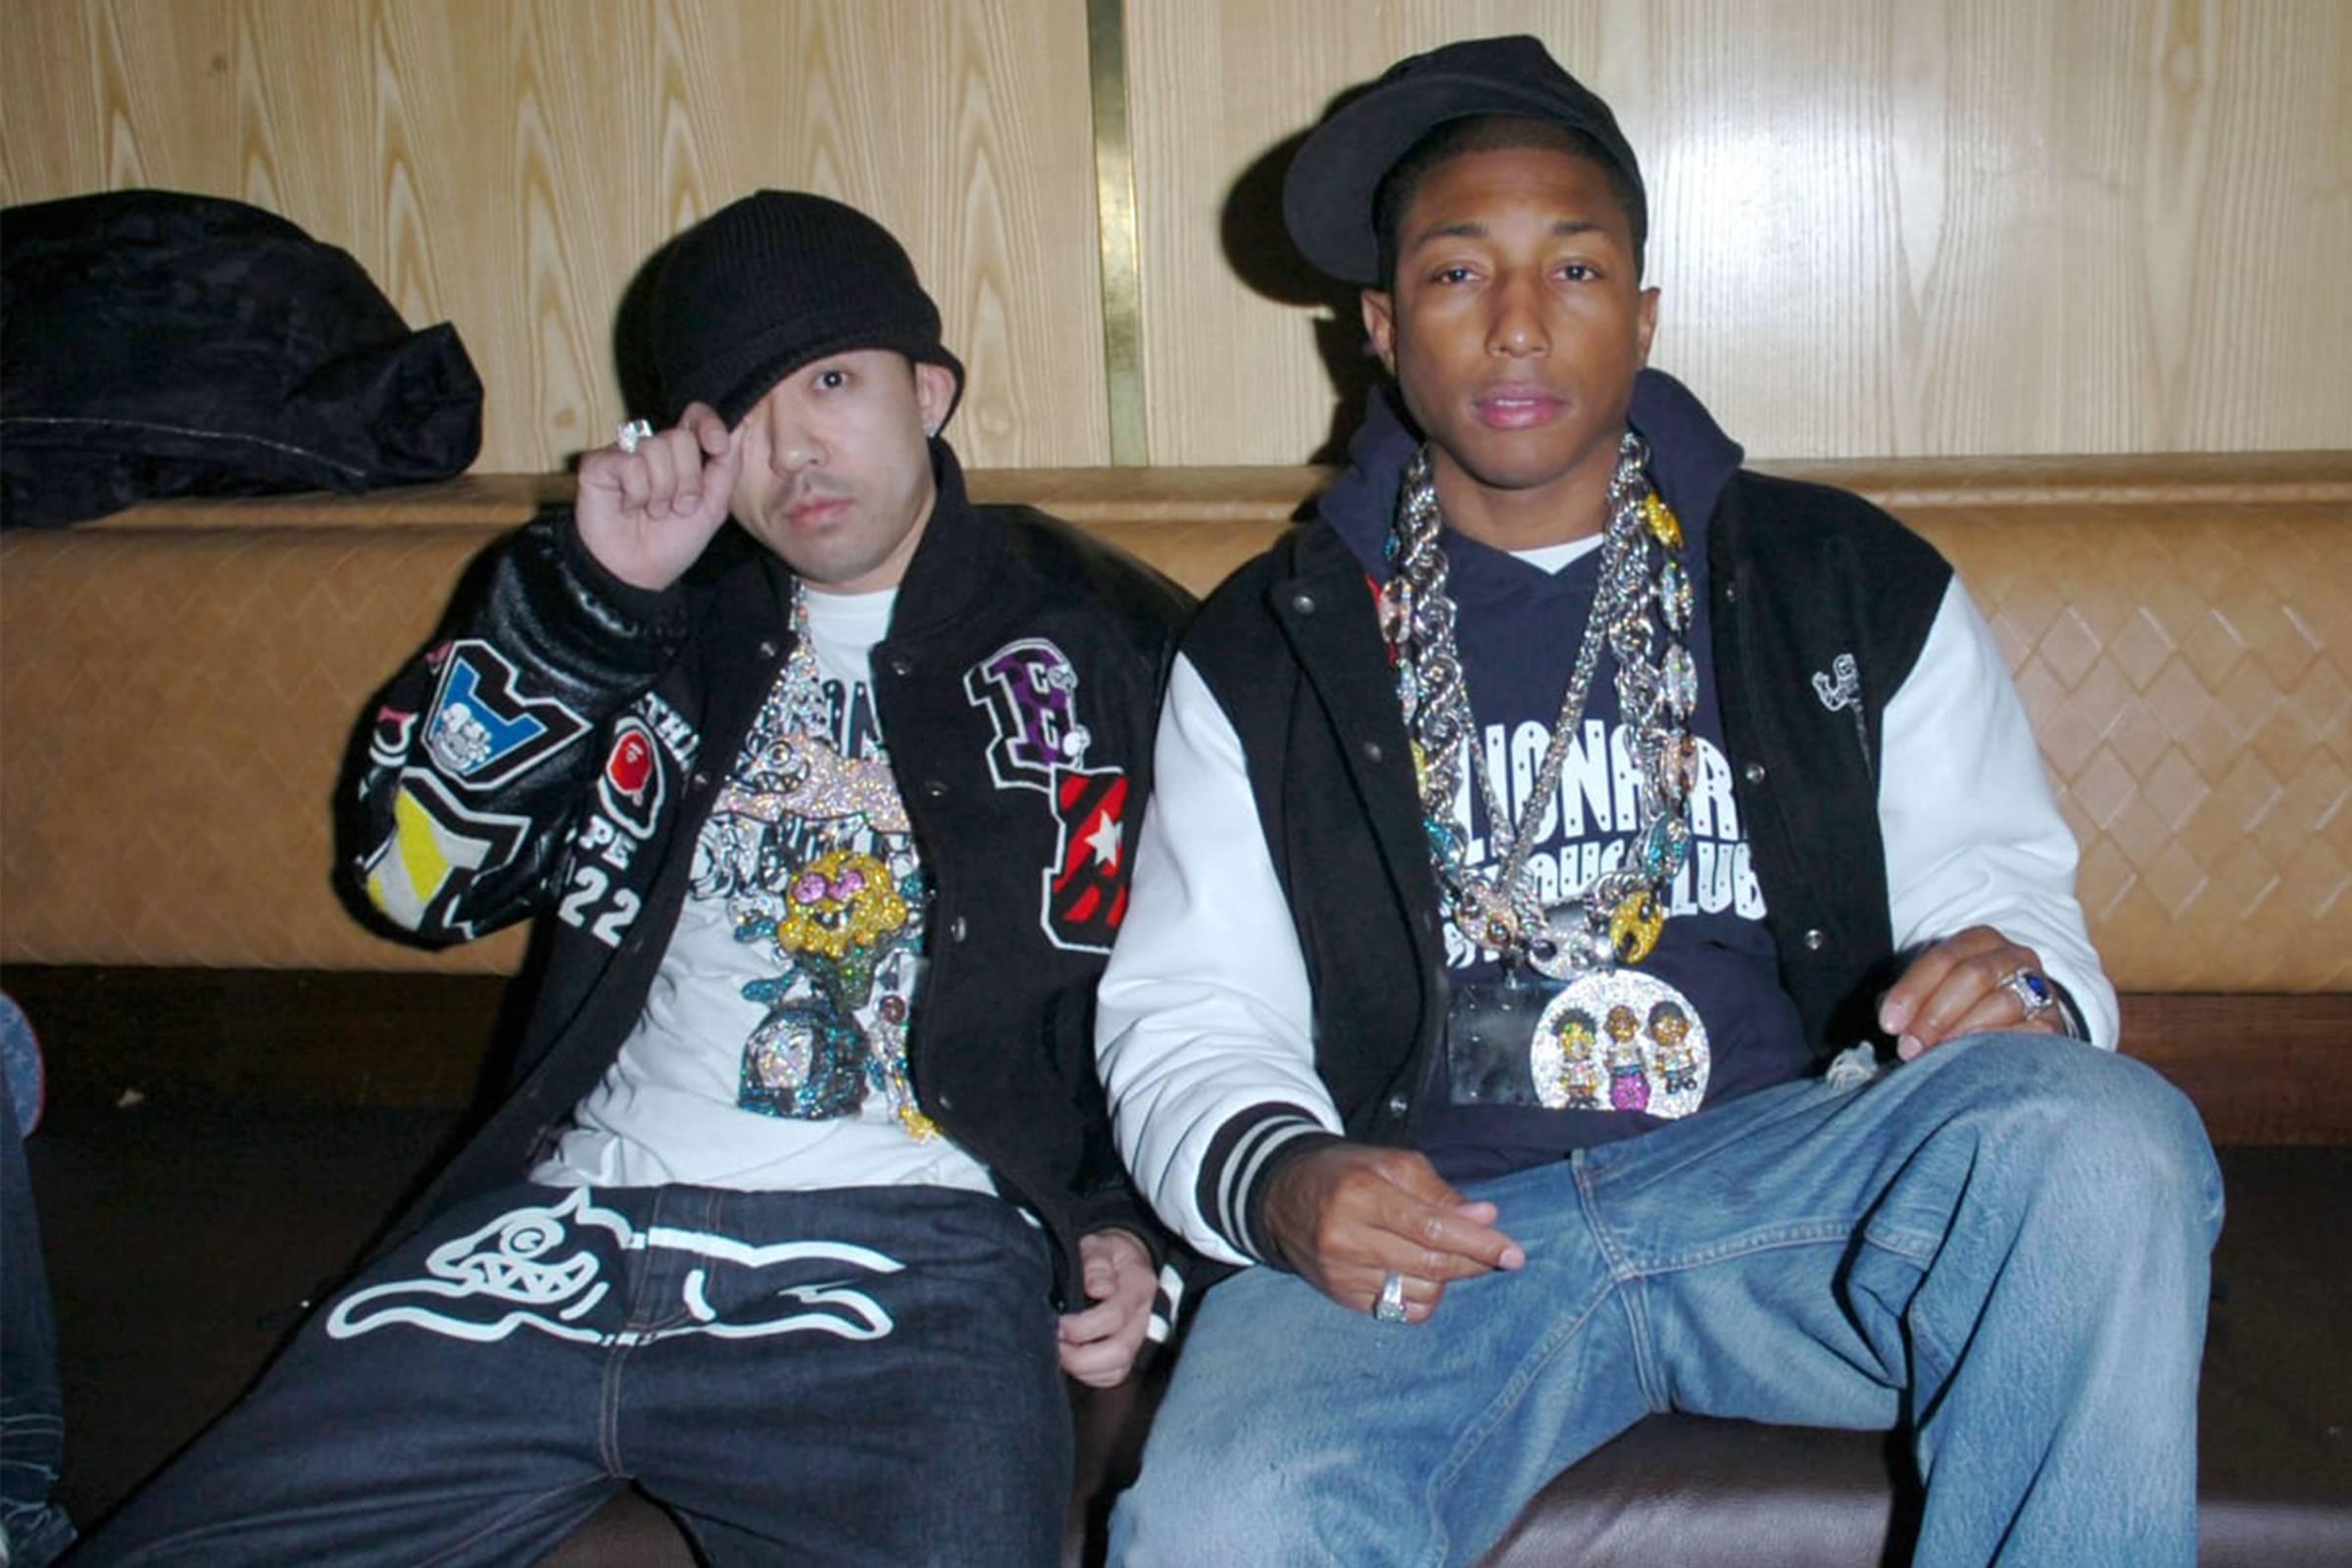 NIGO (left) and Pharrell (right) wearing Billionaire Boys Club (early 2000s)